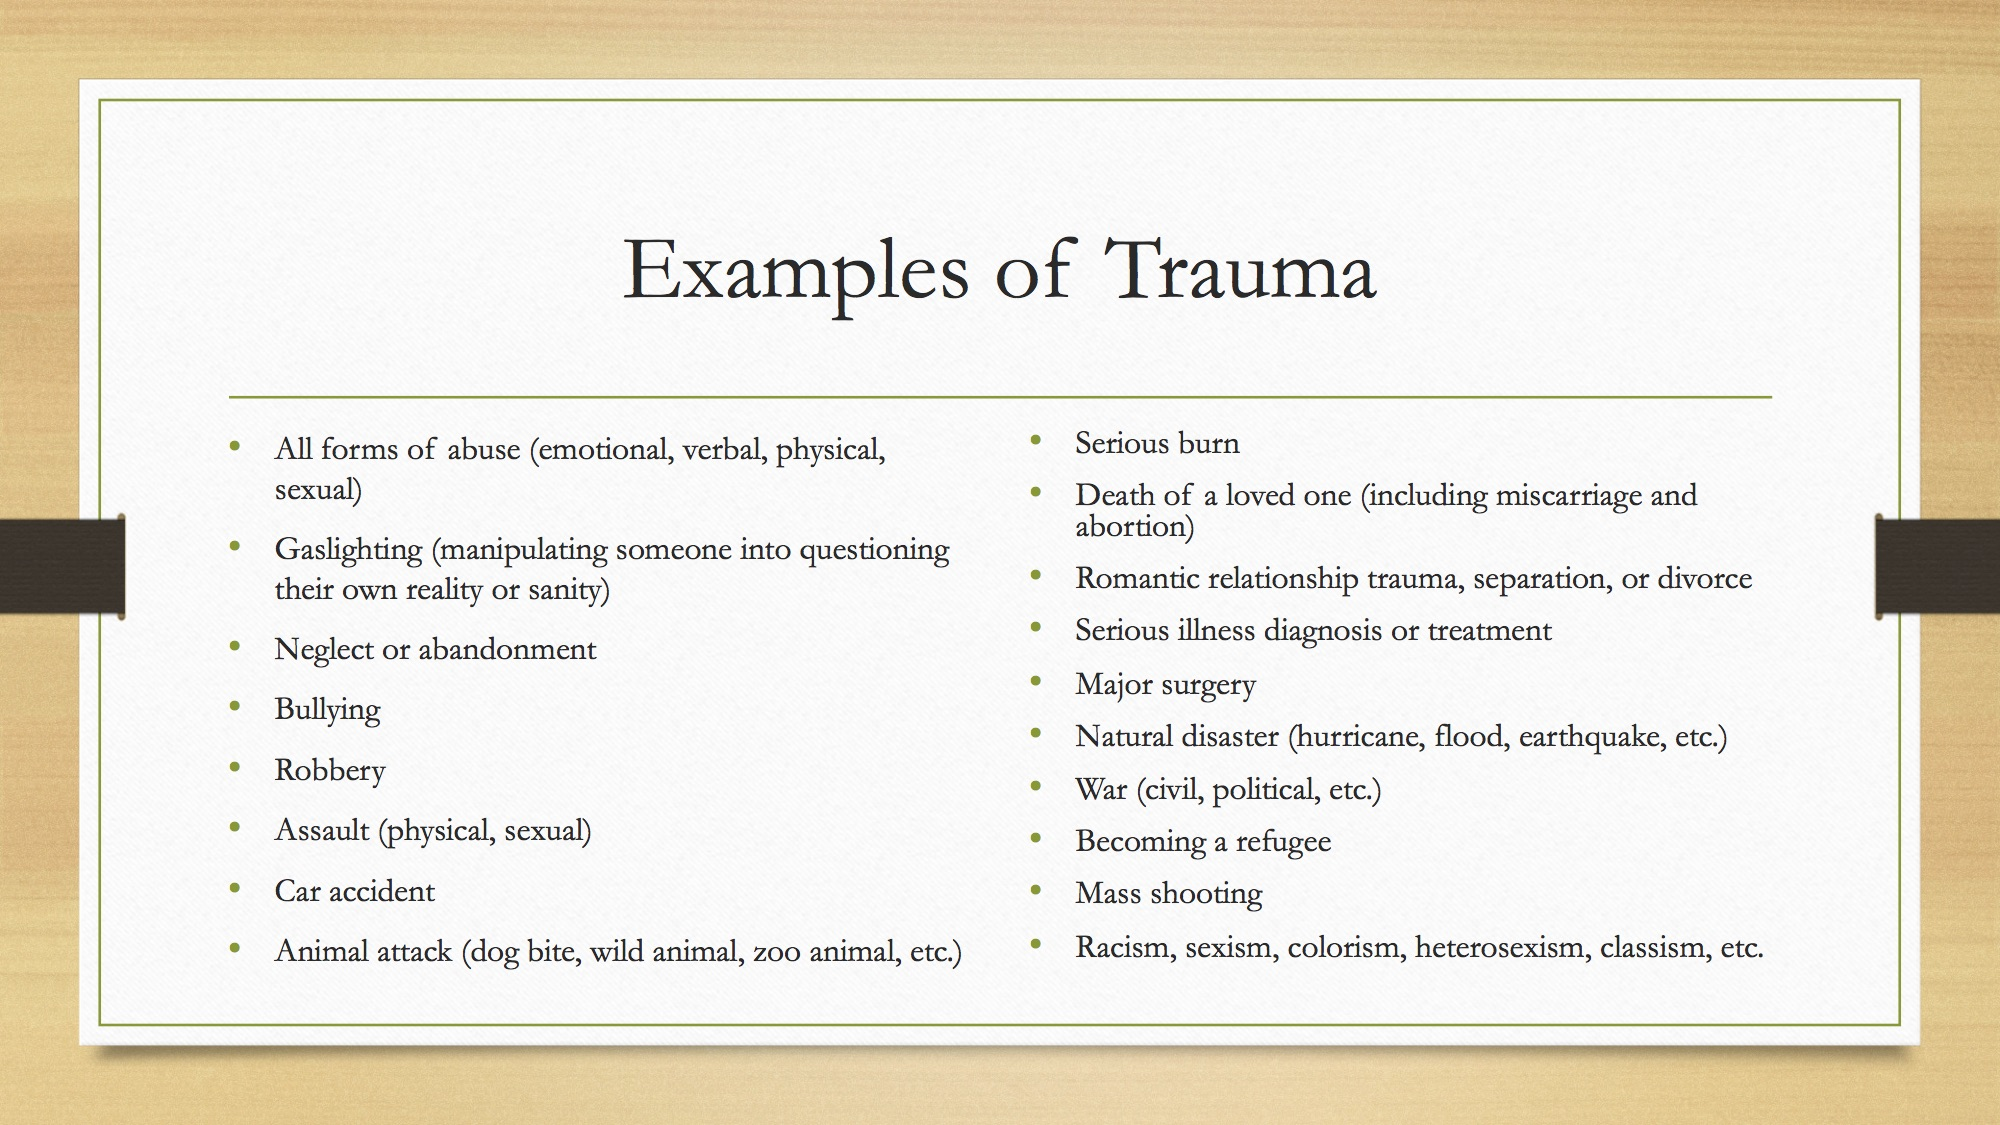 Examples of Trauma